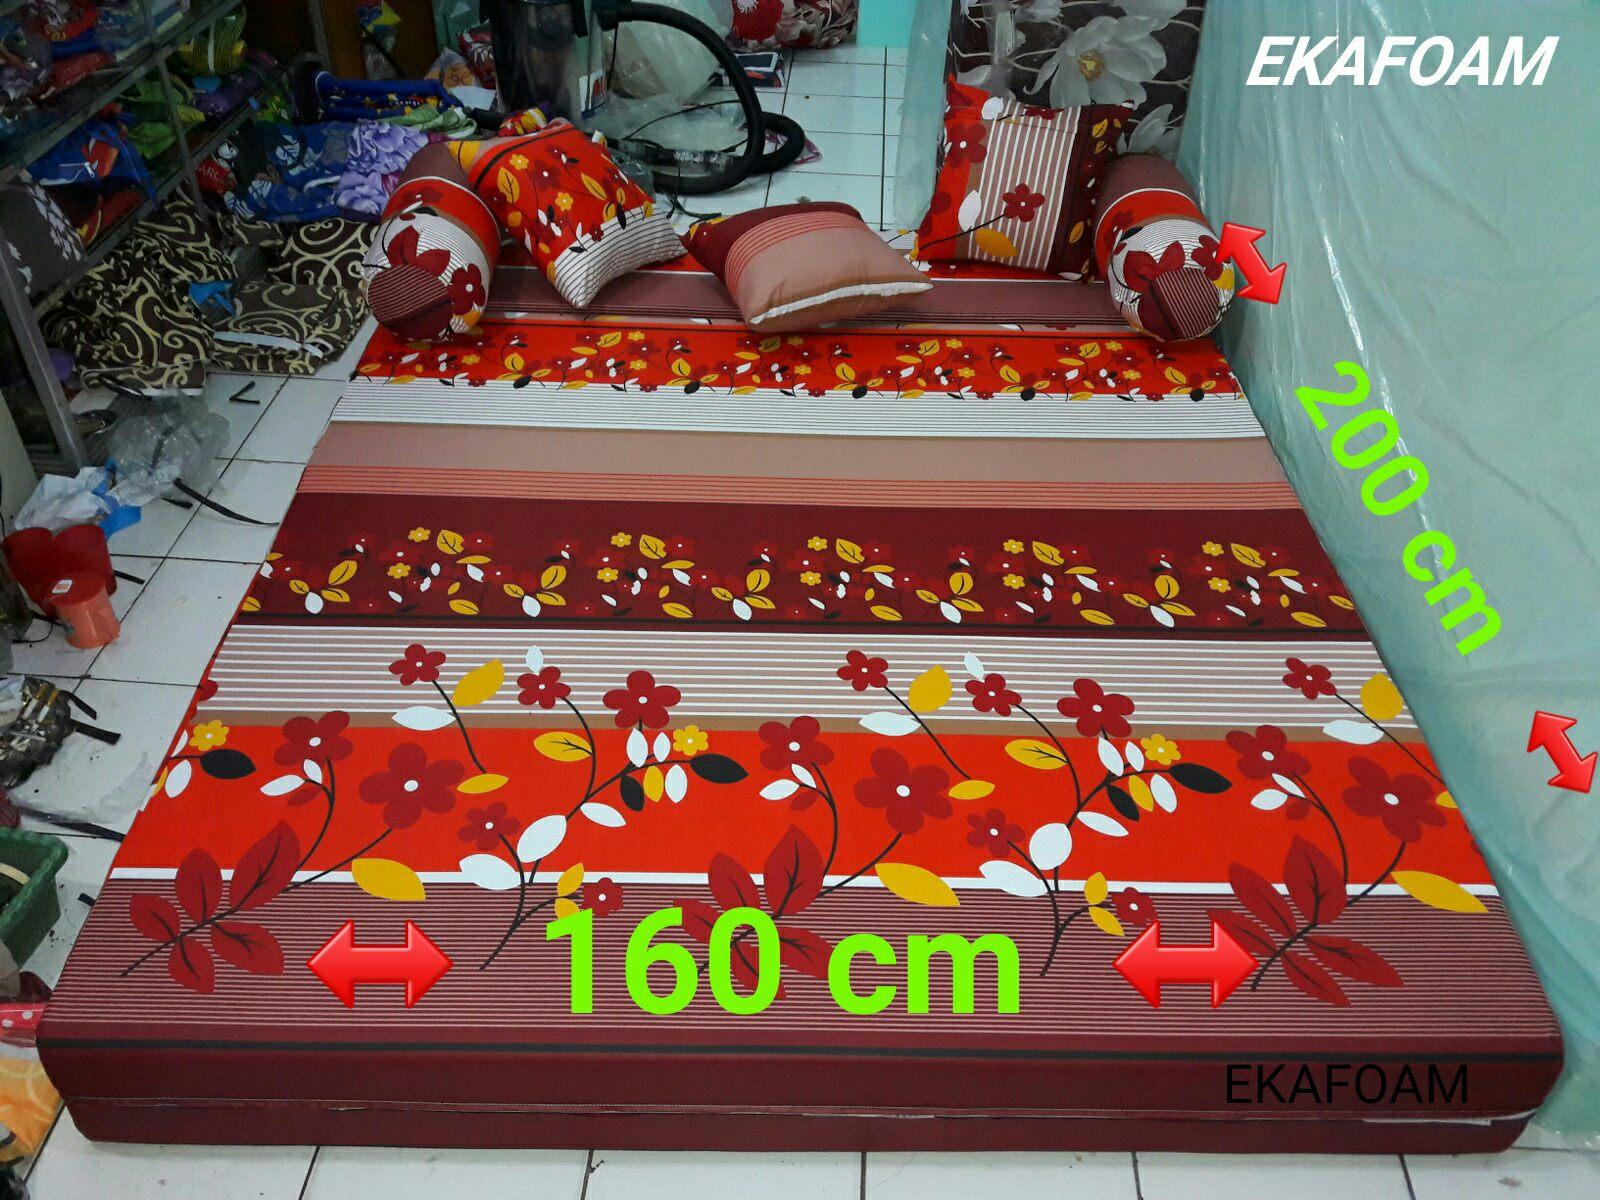 Harga Sofa Bed Inoac No 1 Sleeper On Sale Kasur Terbaru Oktober 2018 Agen Busa